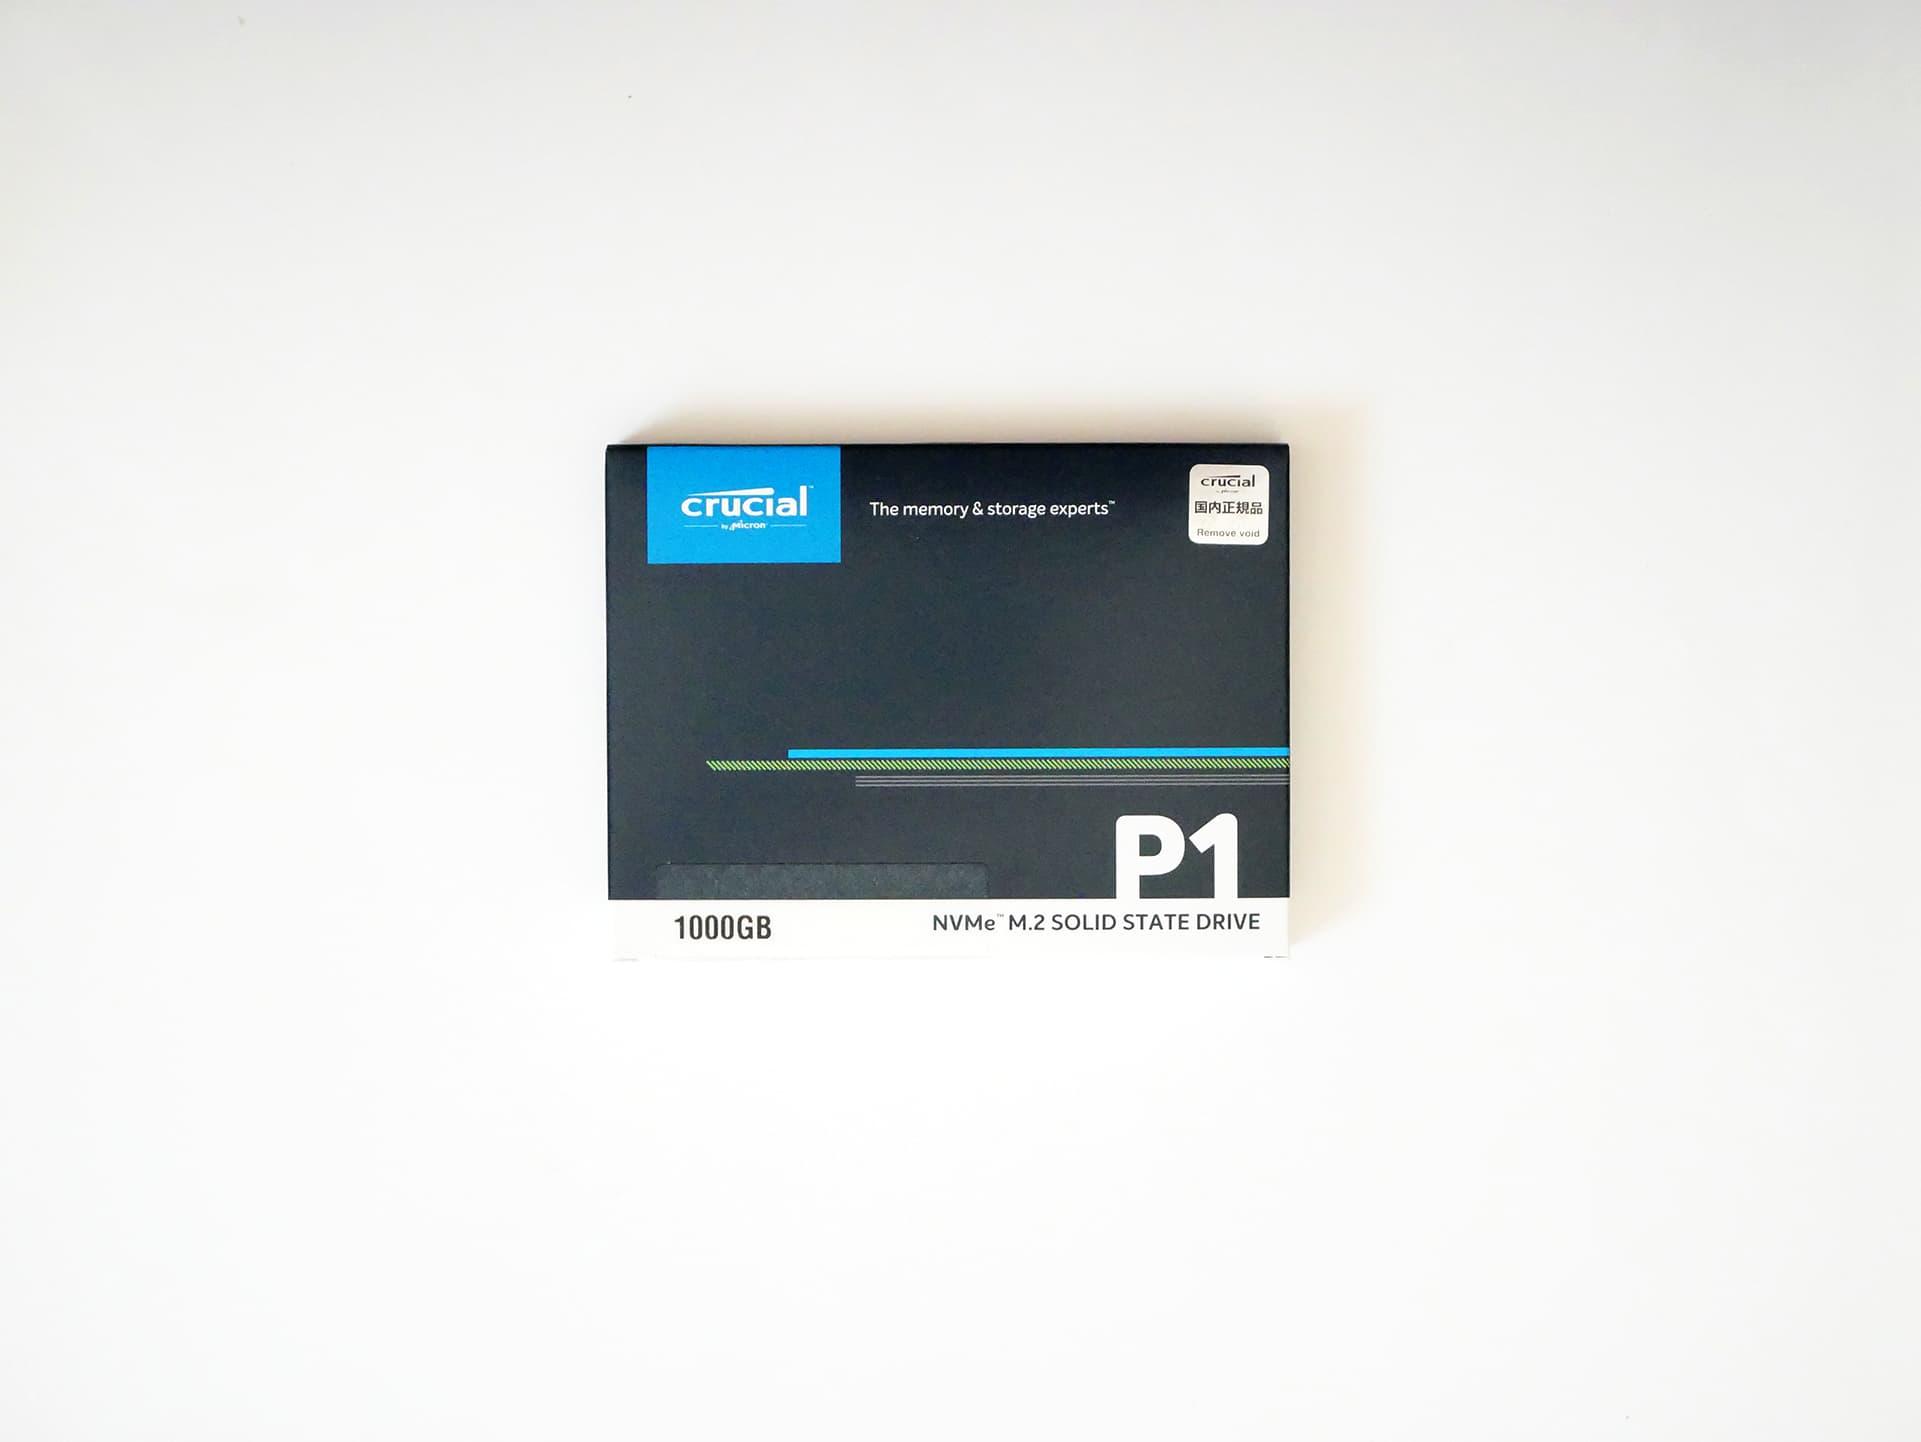 crucial NVMe M.2 SSD P1 1000GB パッケージ